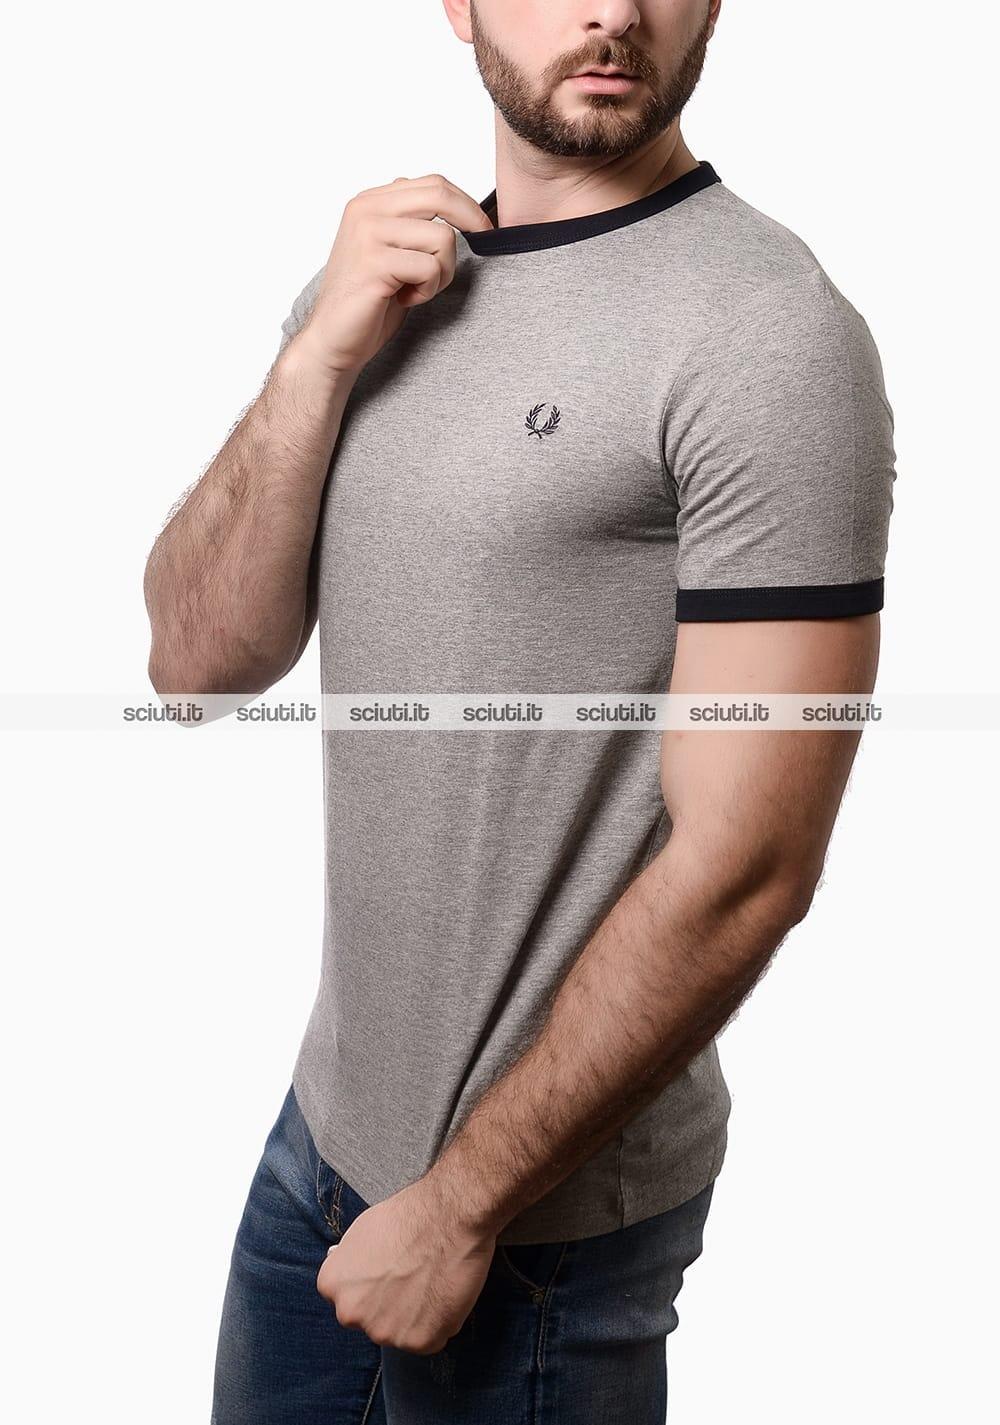 a2c4659513 Tshirt Fred Perry uomo ringer grigio